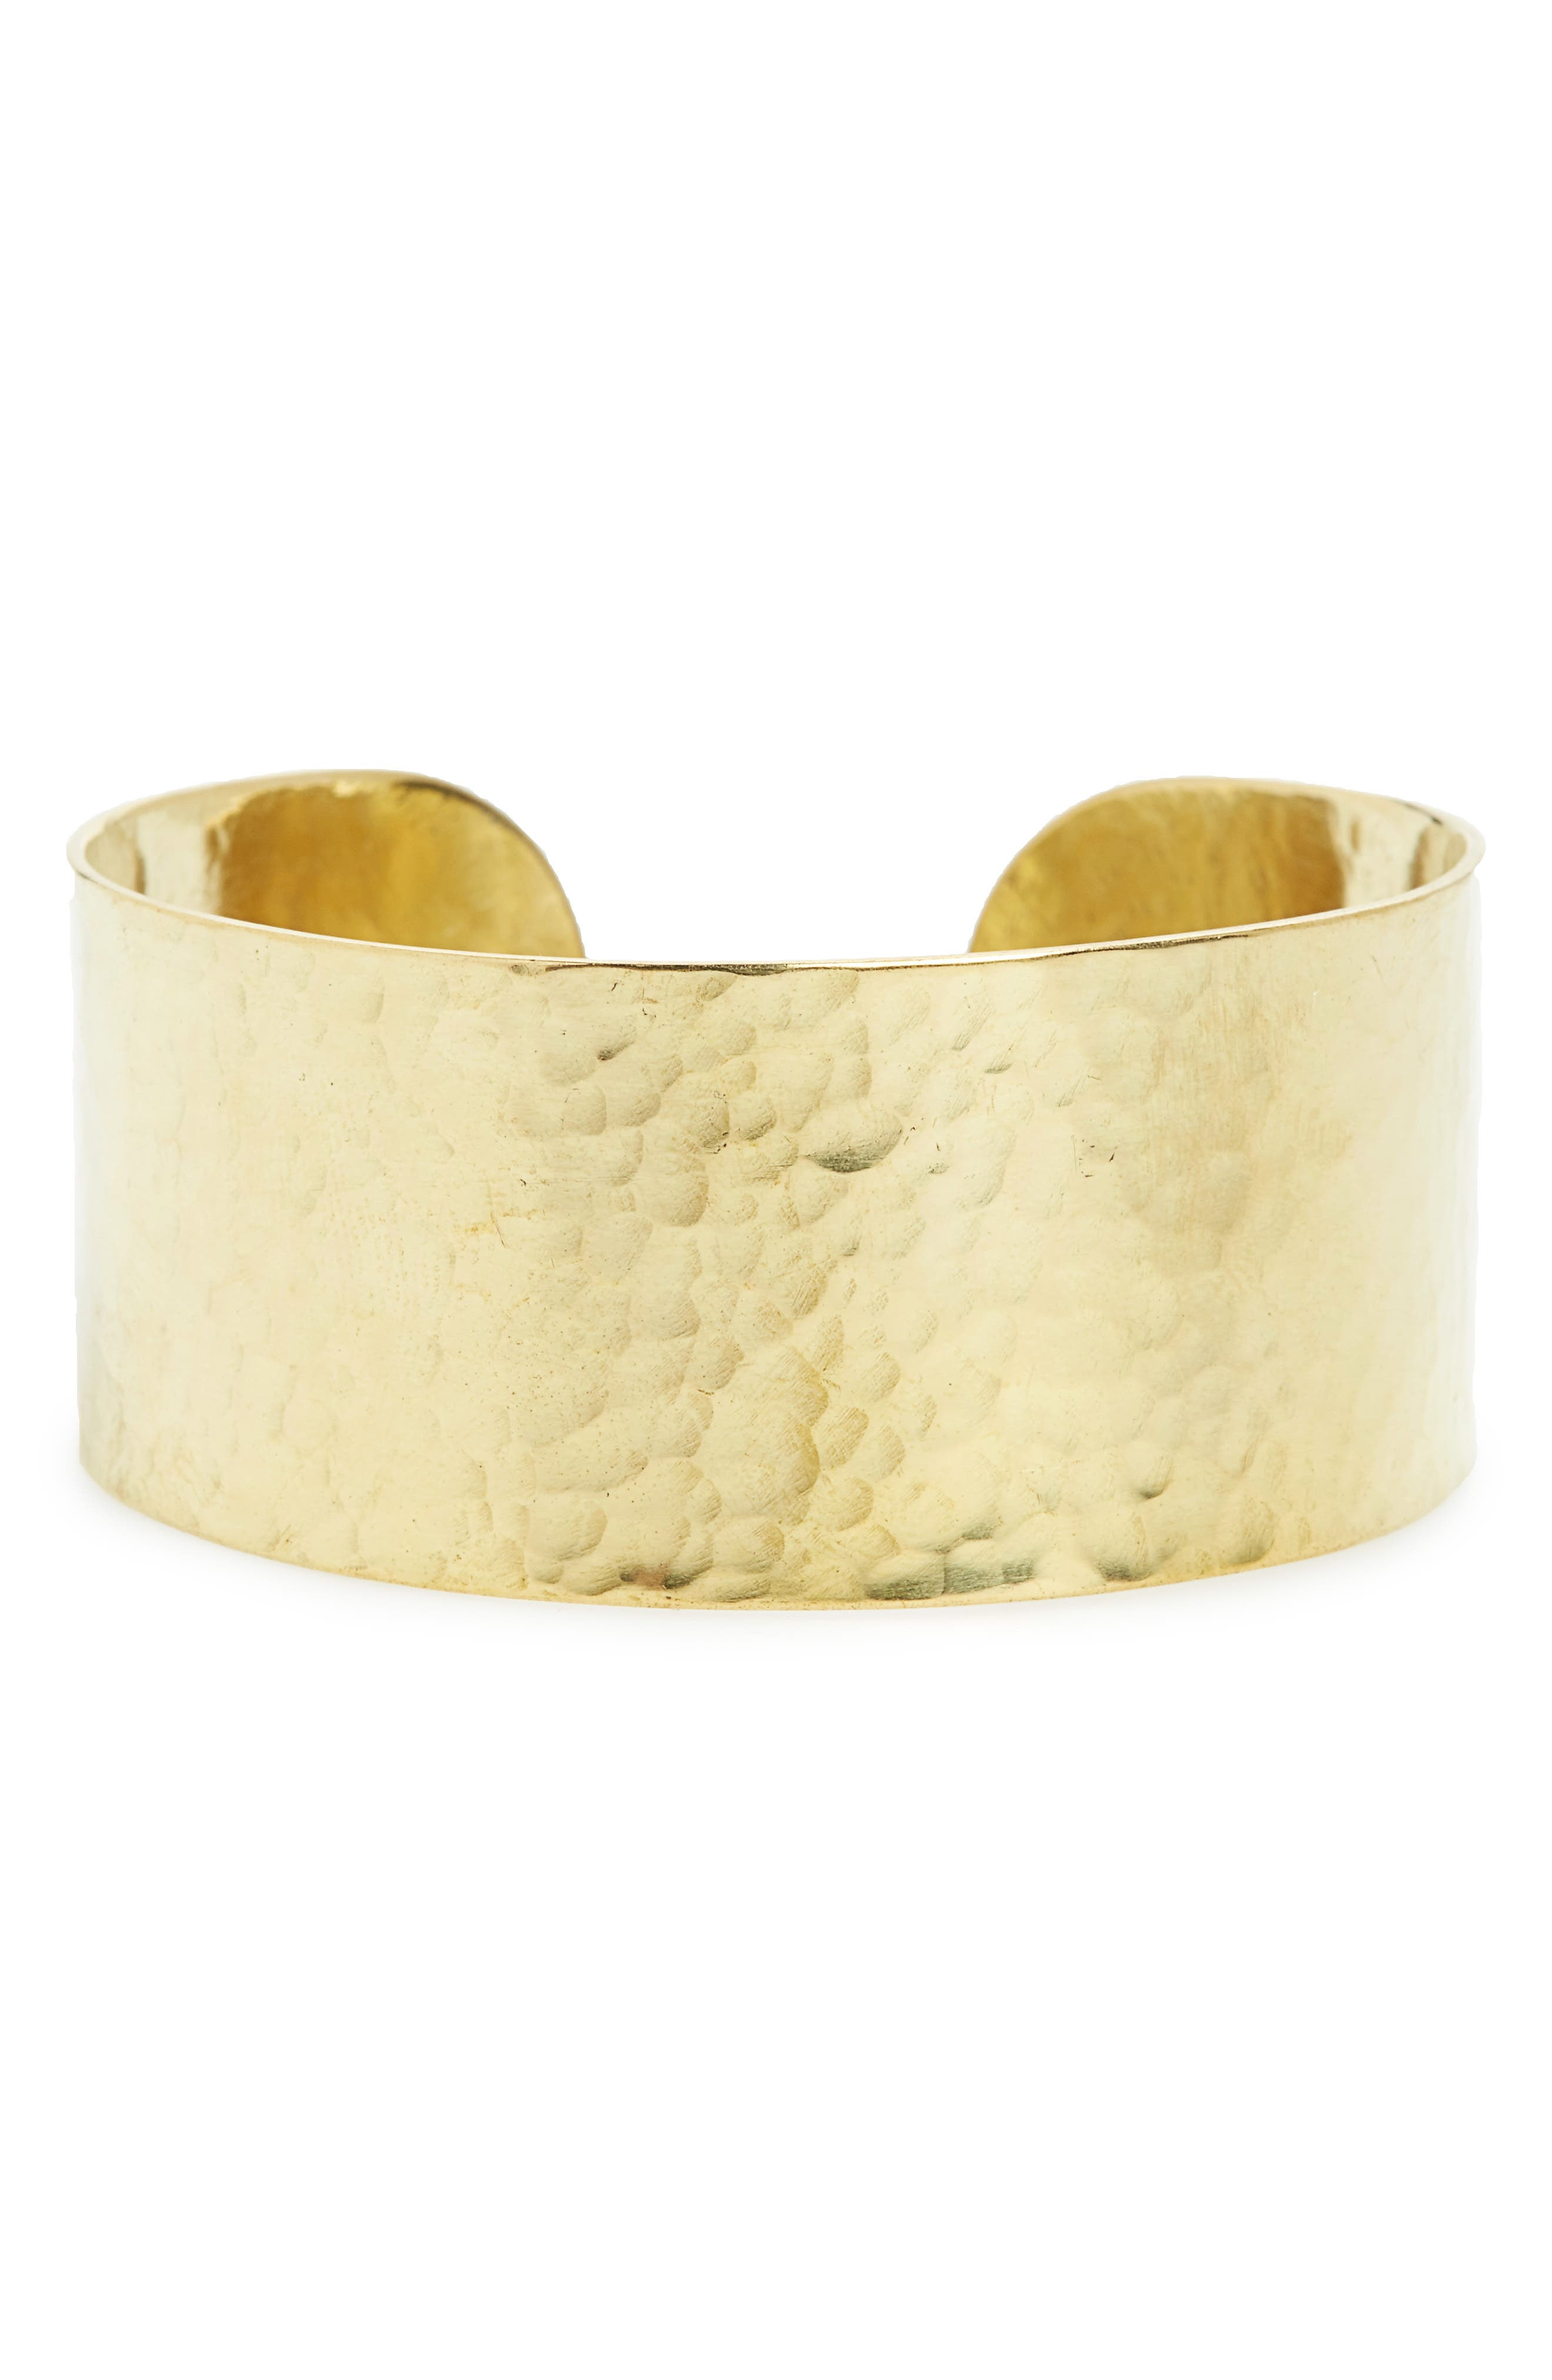 Hammered Brass Cuff,                         Main,                         color, Brass